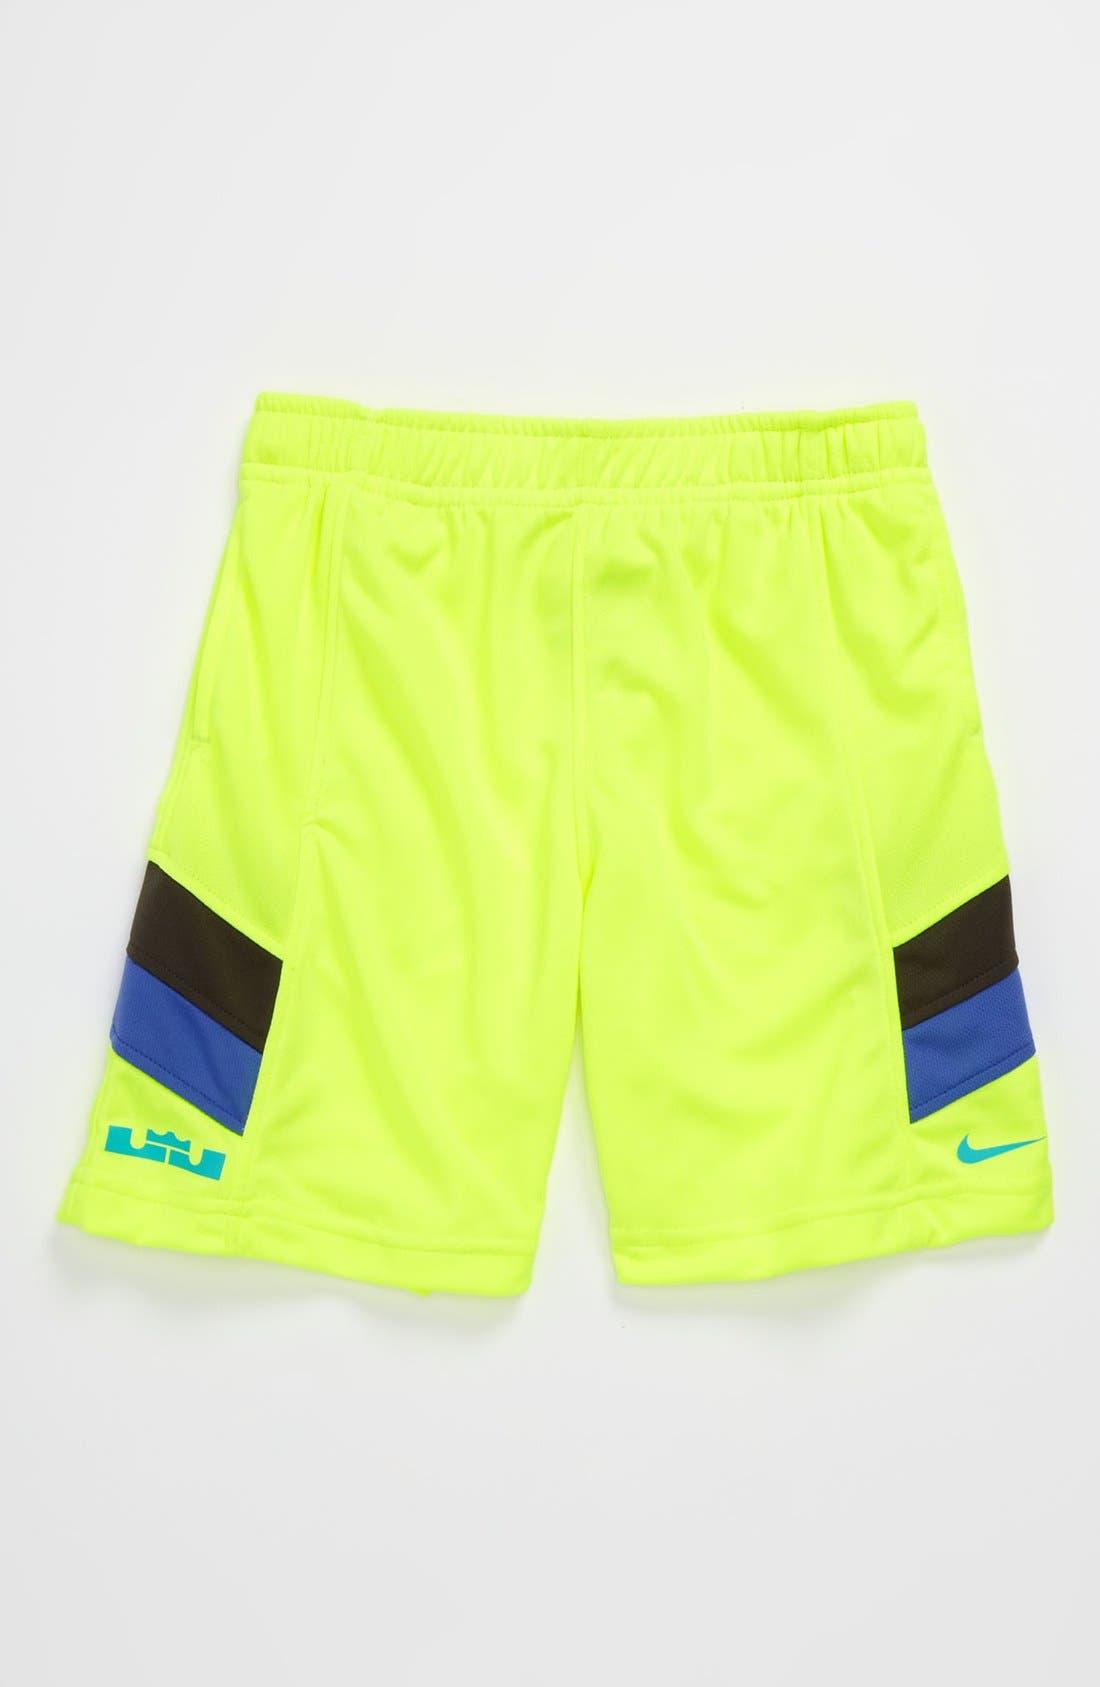 Alternate Image 1 Selected - Nike 'LeBron Essential' Shorts (Little Boys)